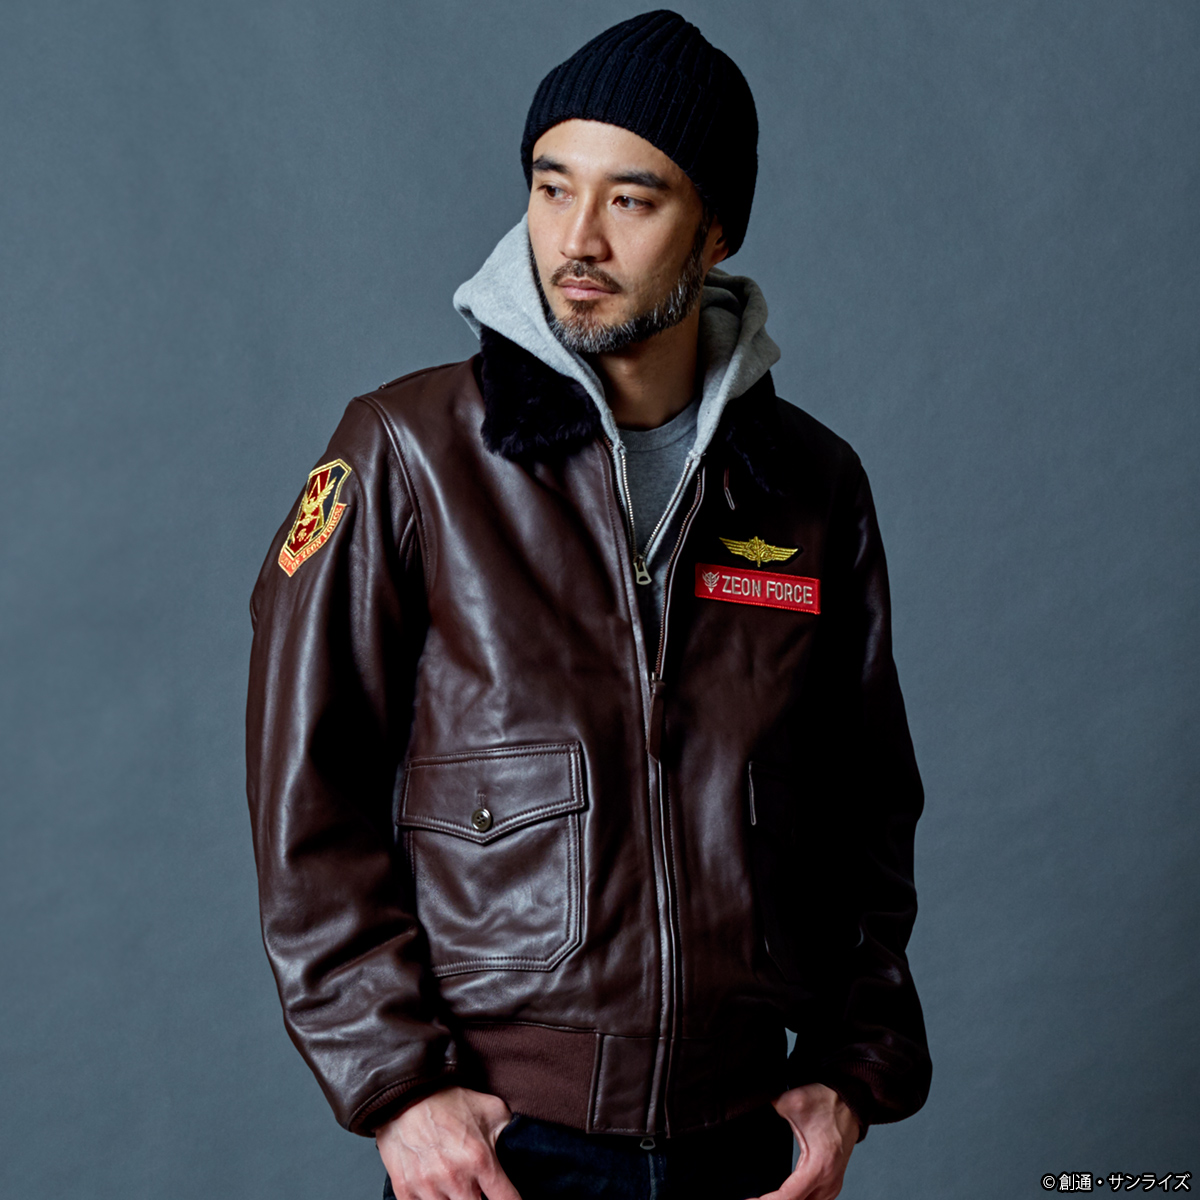 STRICT-G.ARMS『機動戦士ガンダム』G-1 レザージャケット RED COMET